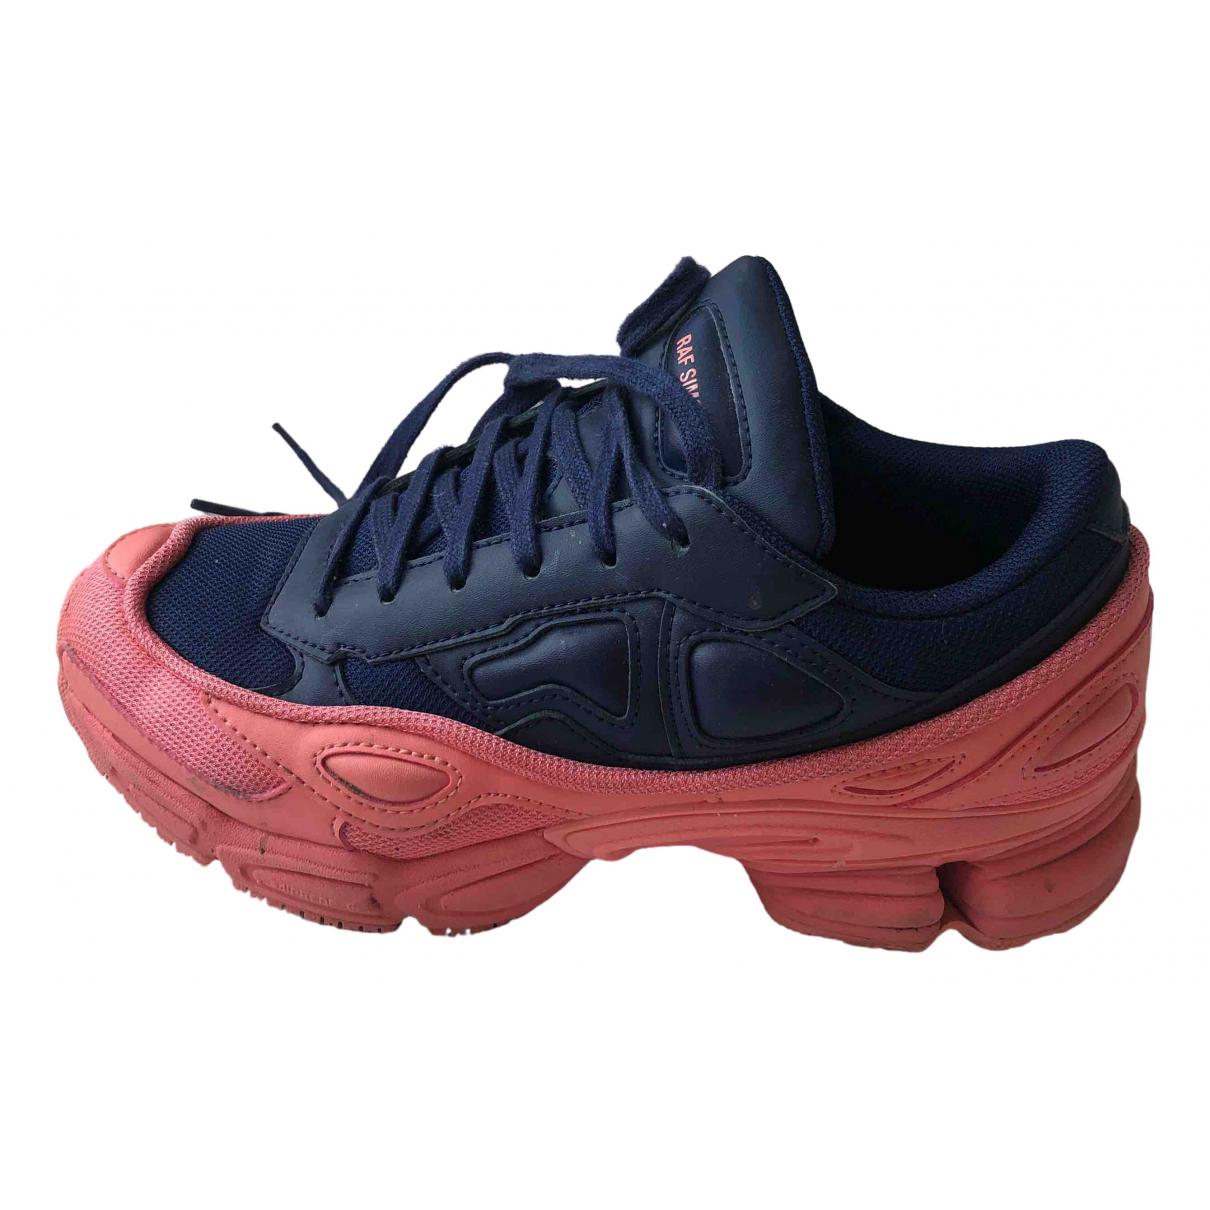 Adidas X Raf Simons Ozweego 2 Purple Cloth Trainers for Women 37 EU